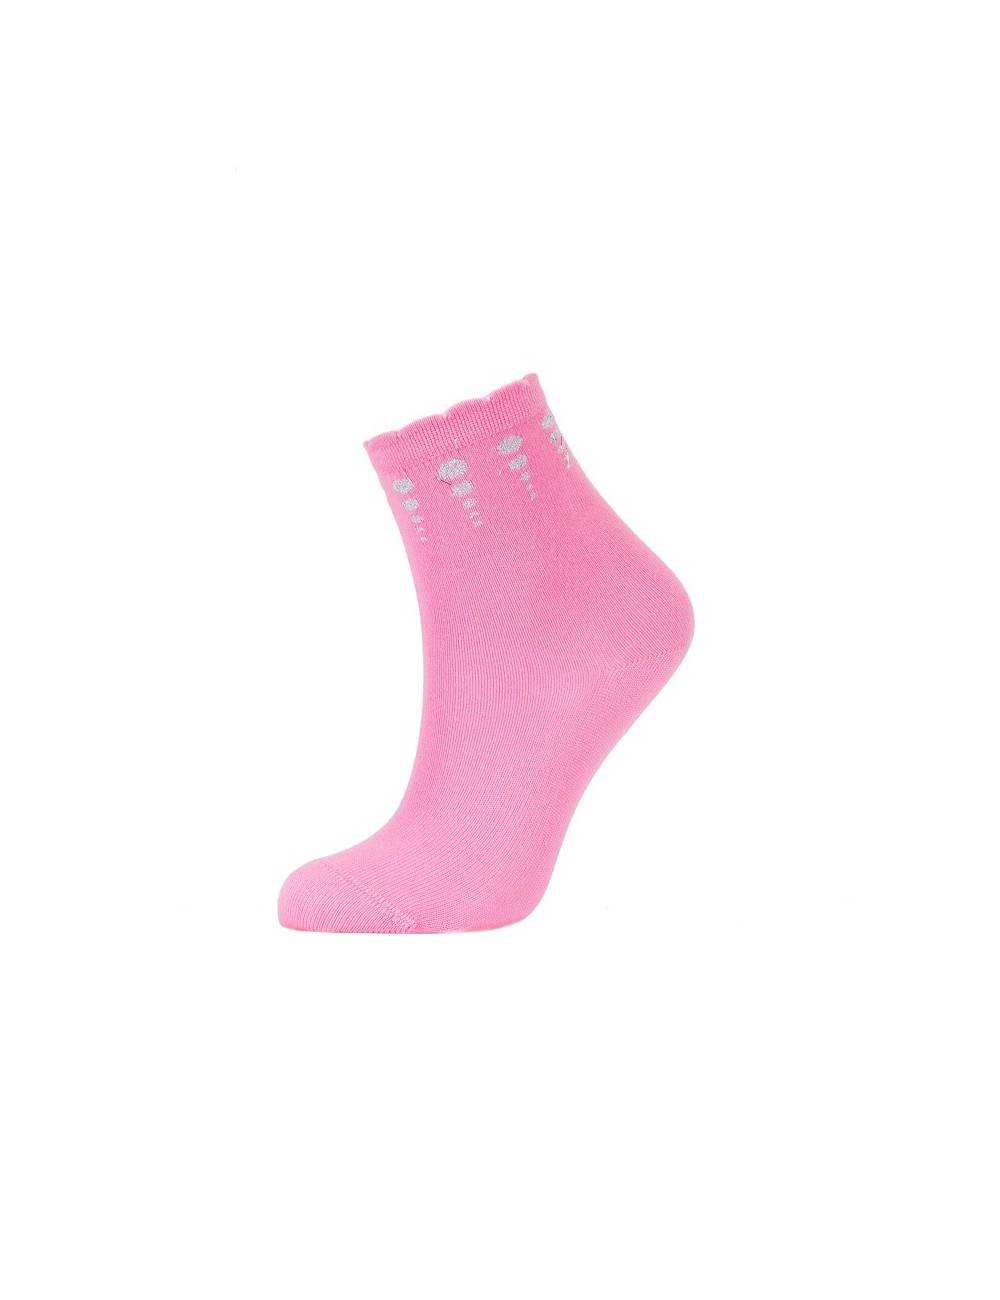 68ba68bb334 Παιδικές κάλτσες για κορίτσια από νύμα Micromodal